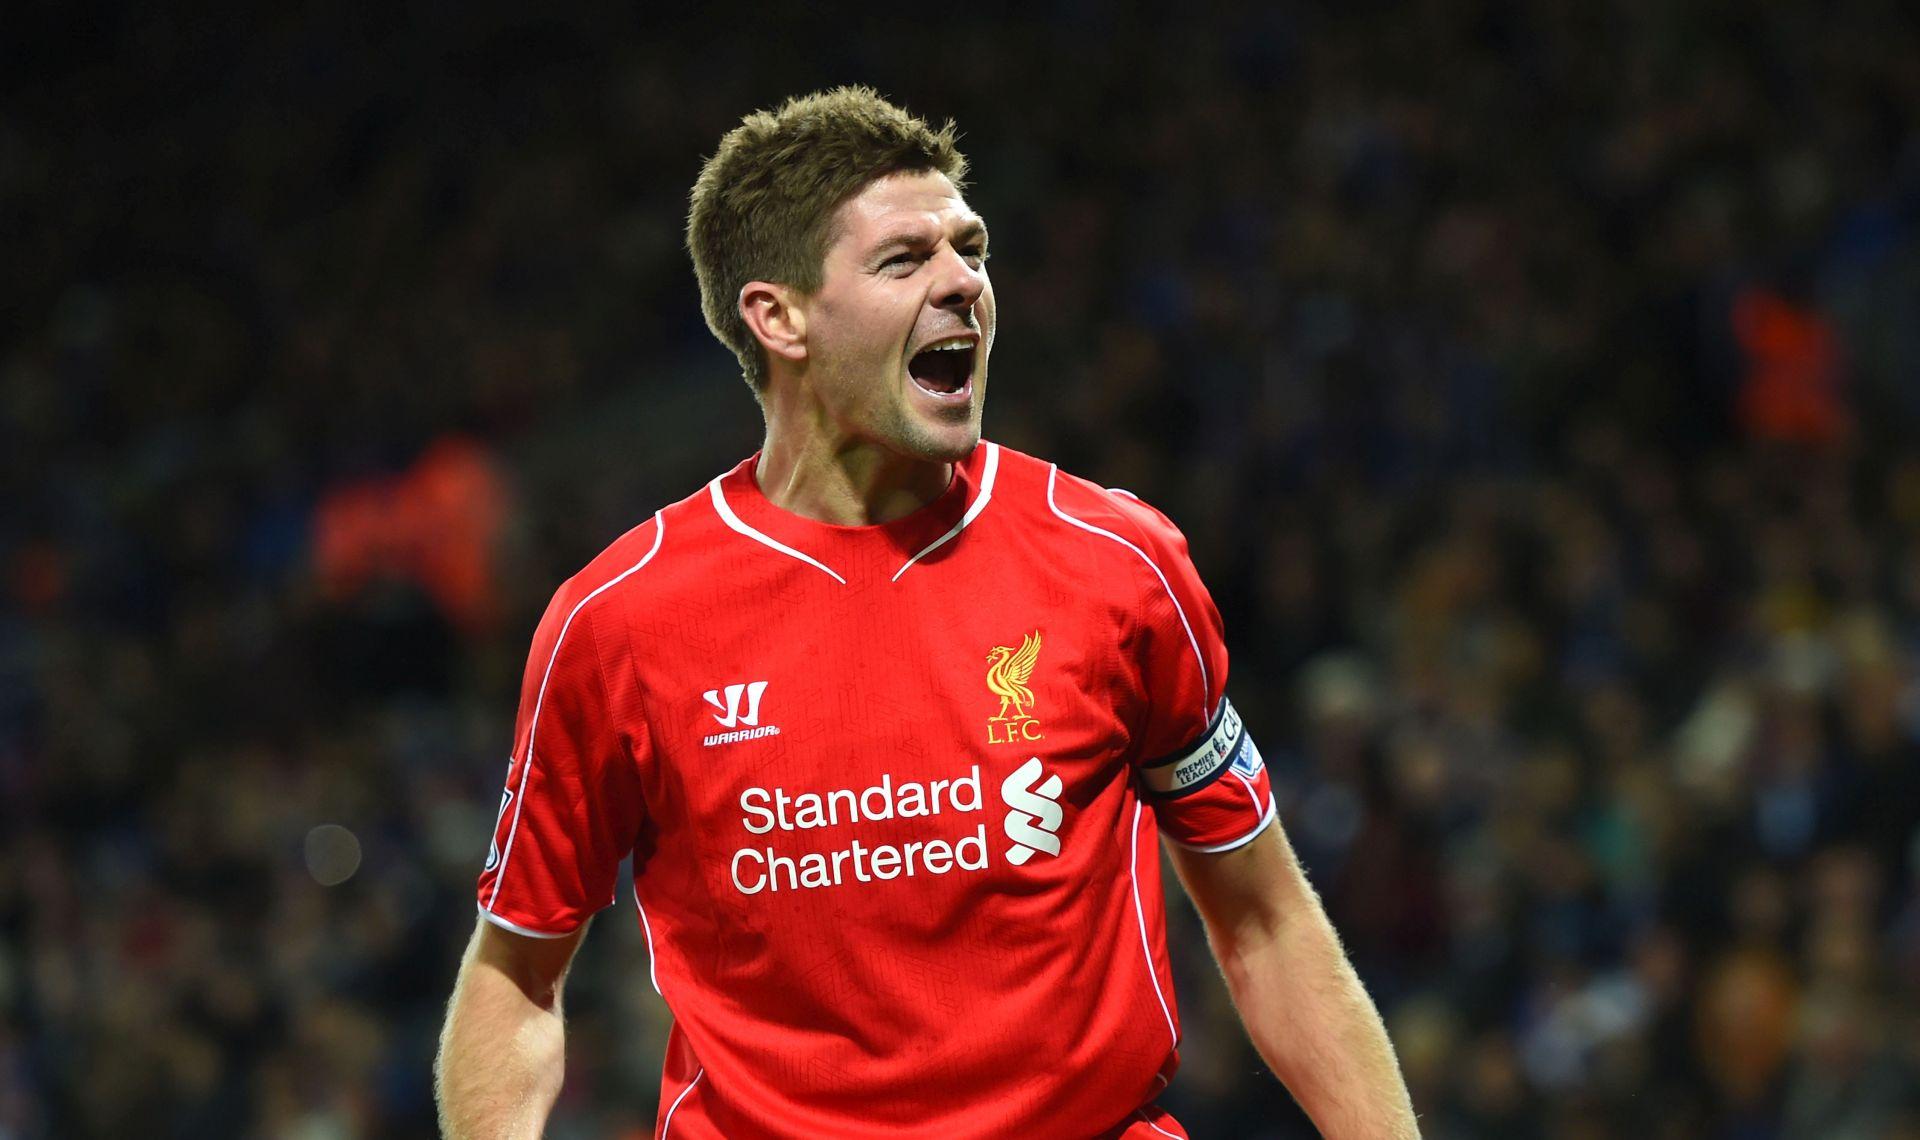 BIVŠI KAPETAN LIVERPOOLA Pogodak i asistencija Gerrarda u MLS debiju